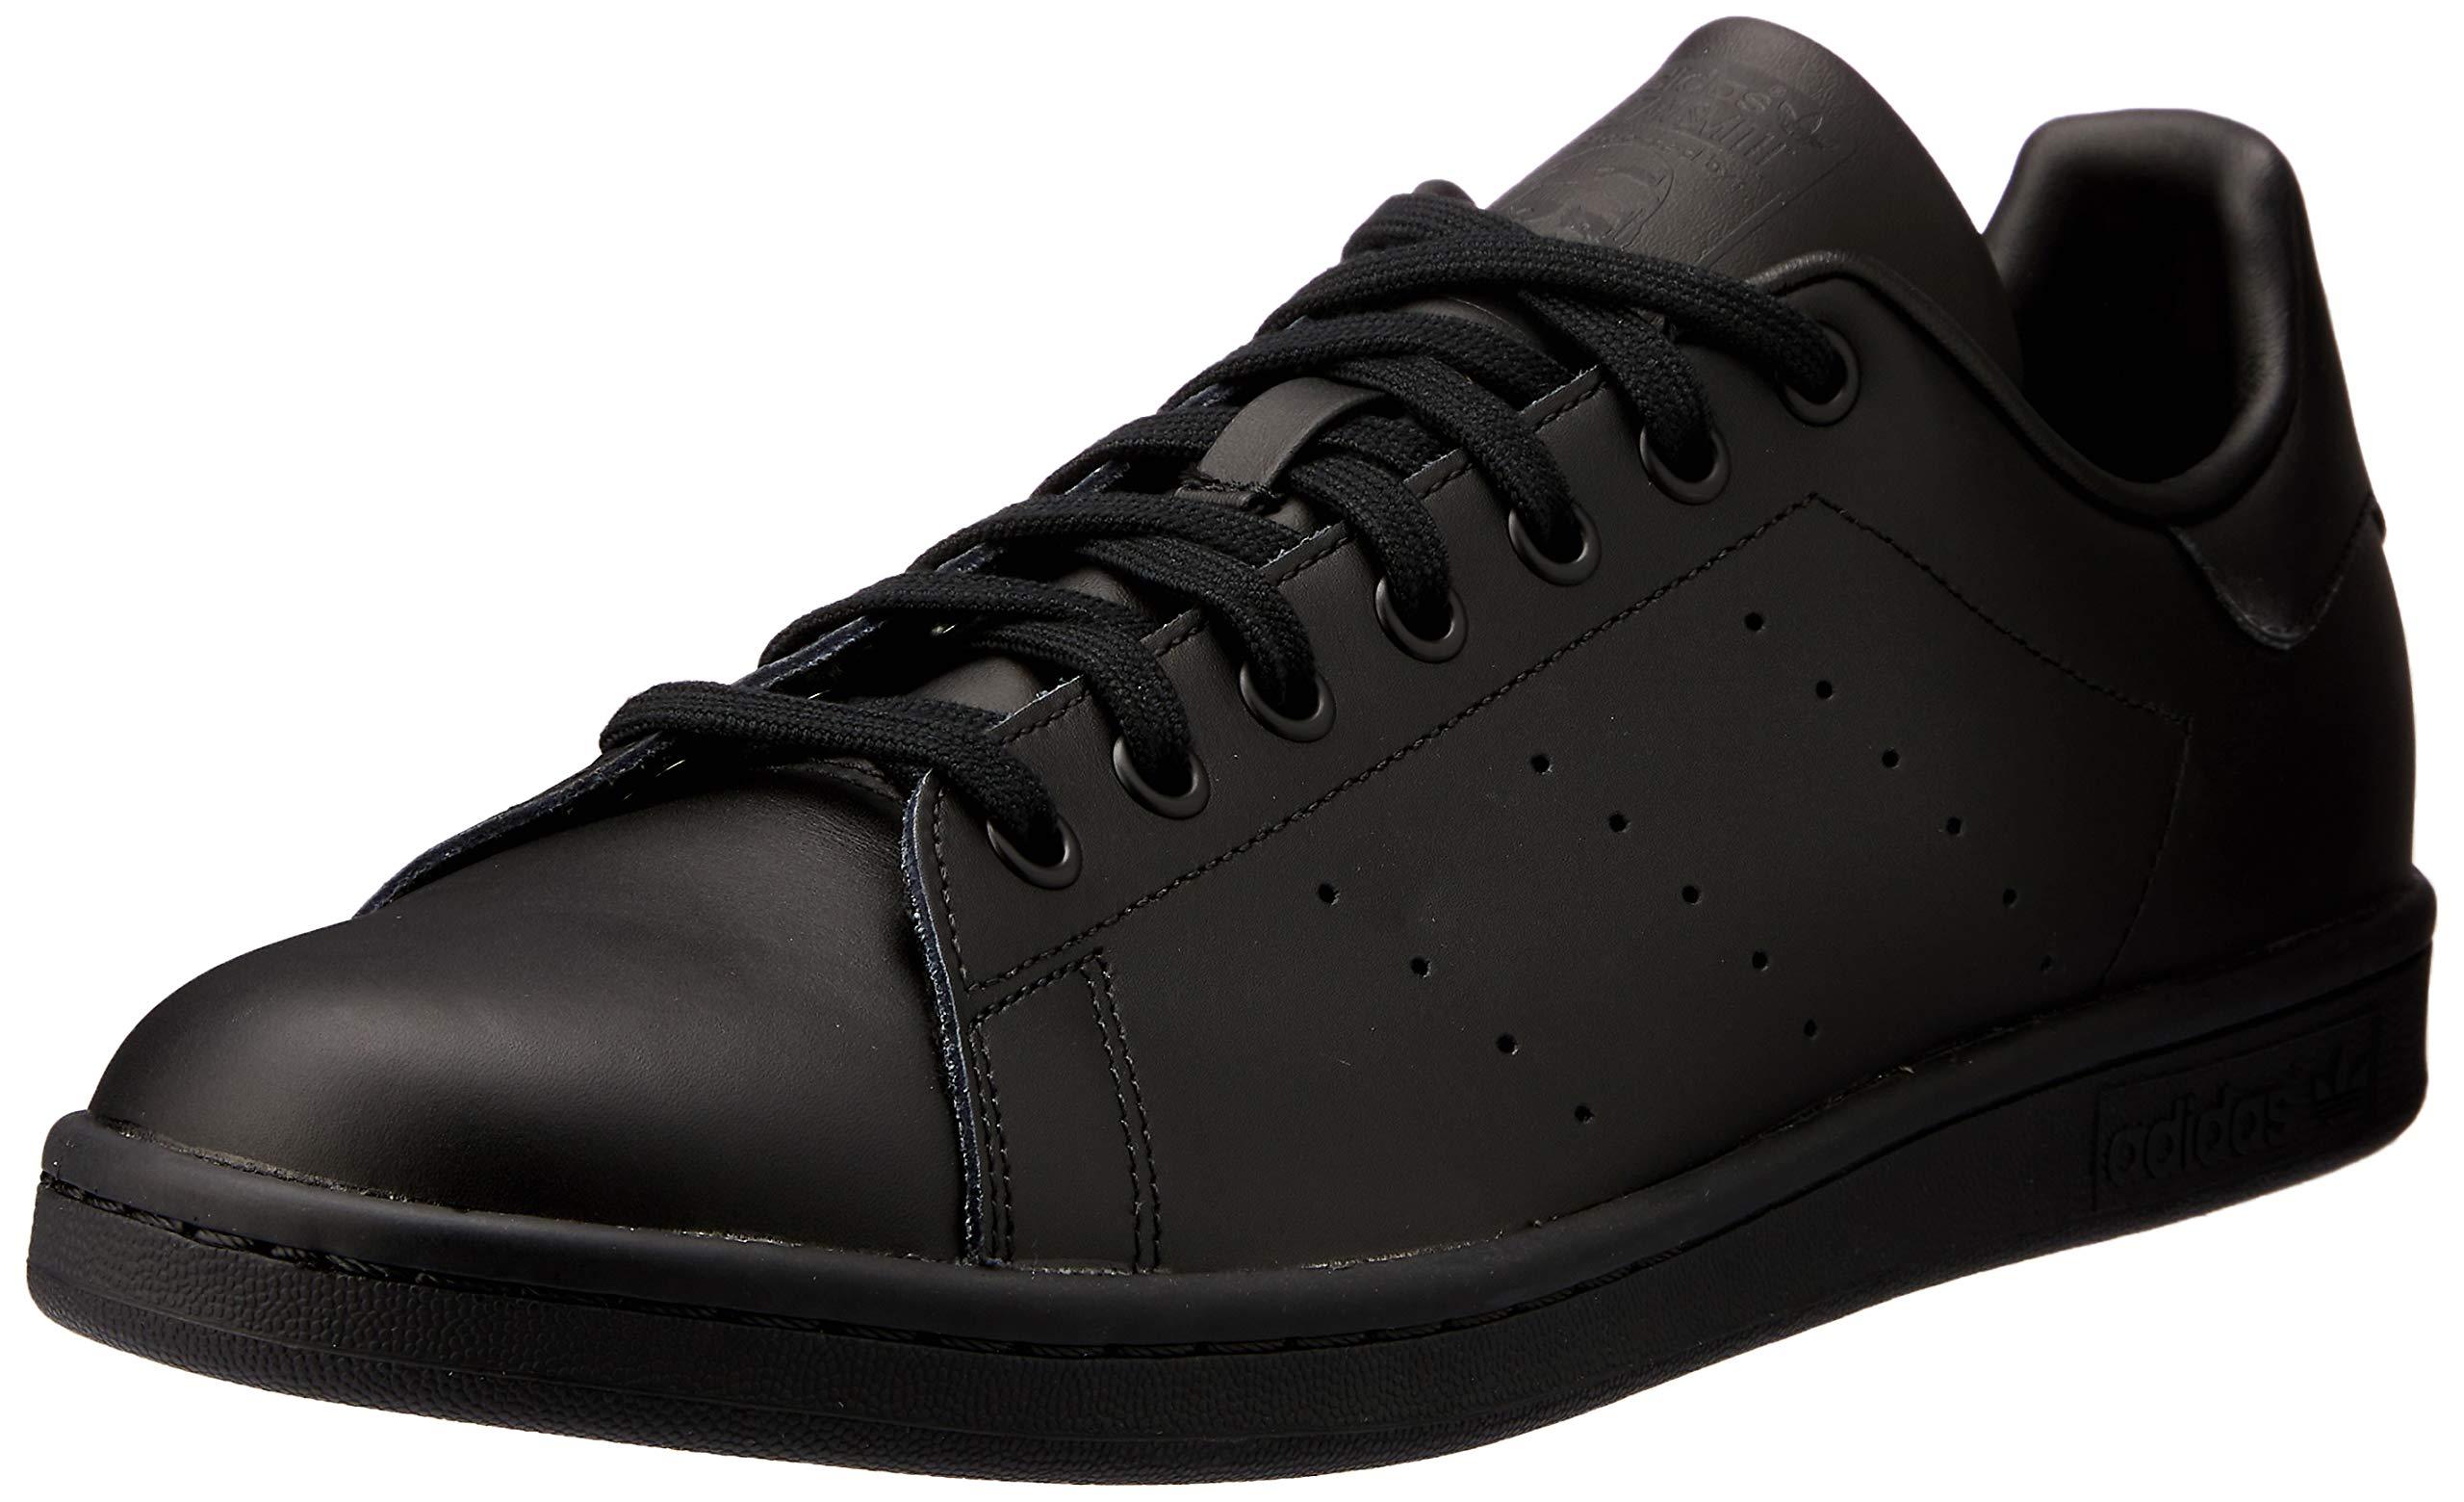 adidas Trainers, Sneakers Unisex-Adulto 1 spesavip